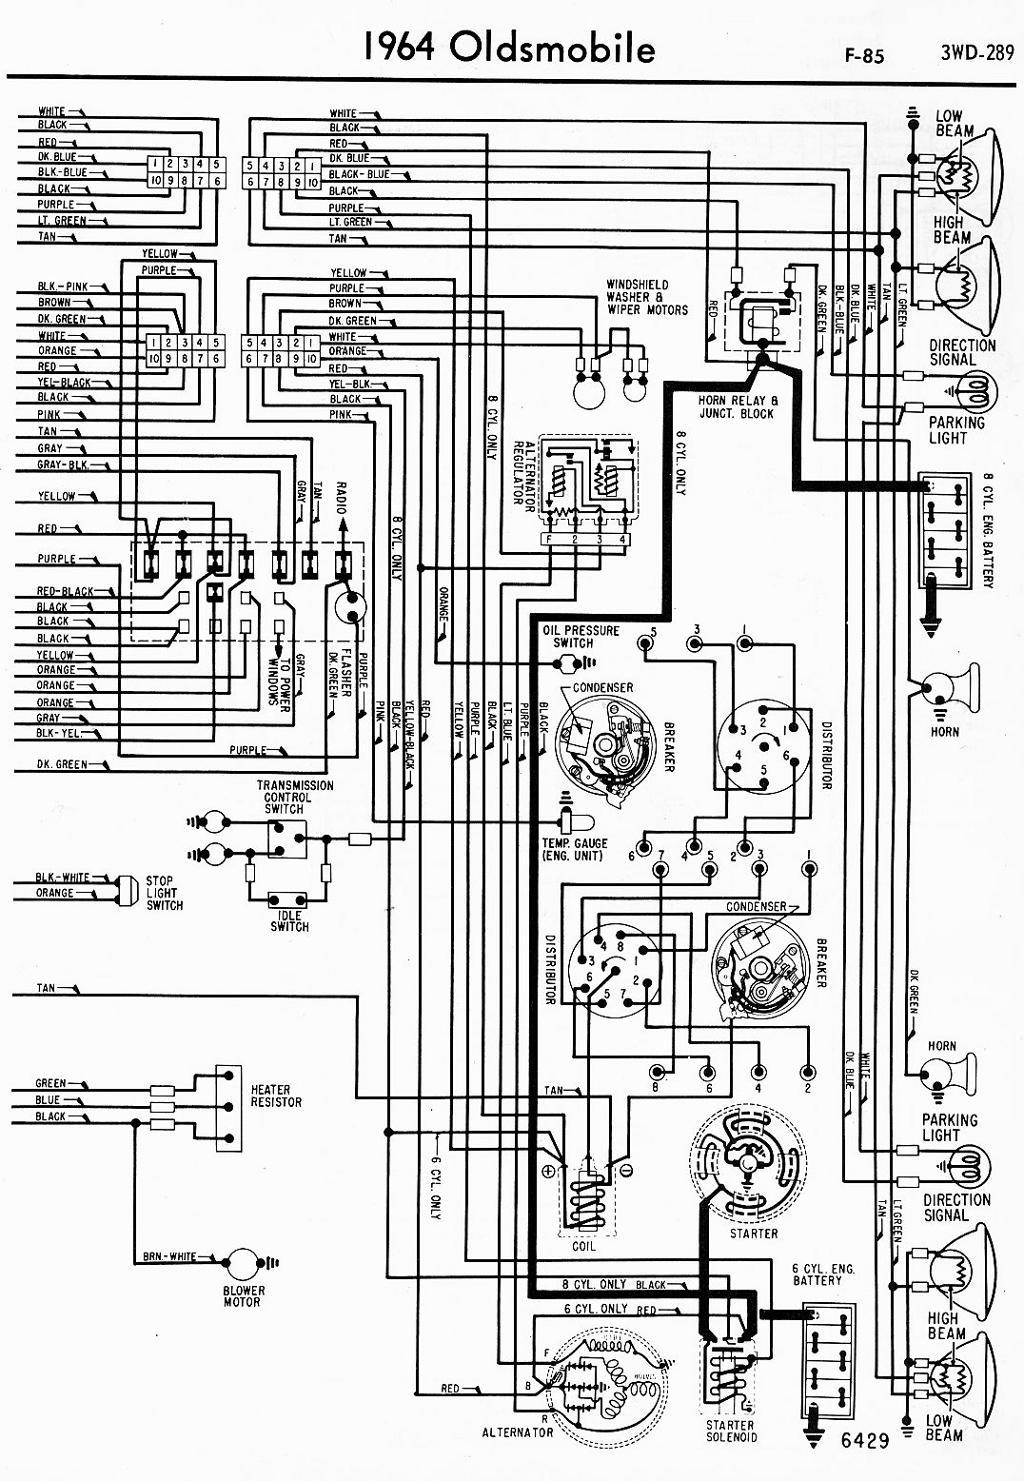 wiring diagrams 1998 aurora v8 trusted wiring diagrams \u2022 olds aurora engine size oldsmobile car manuals wiring diagrams pdf fault codes rh automotive manuals net 1998 oldsmobile aurora 2013